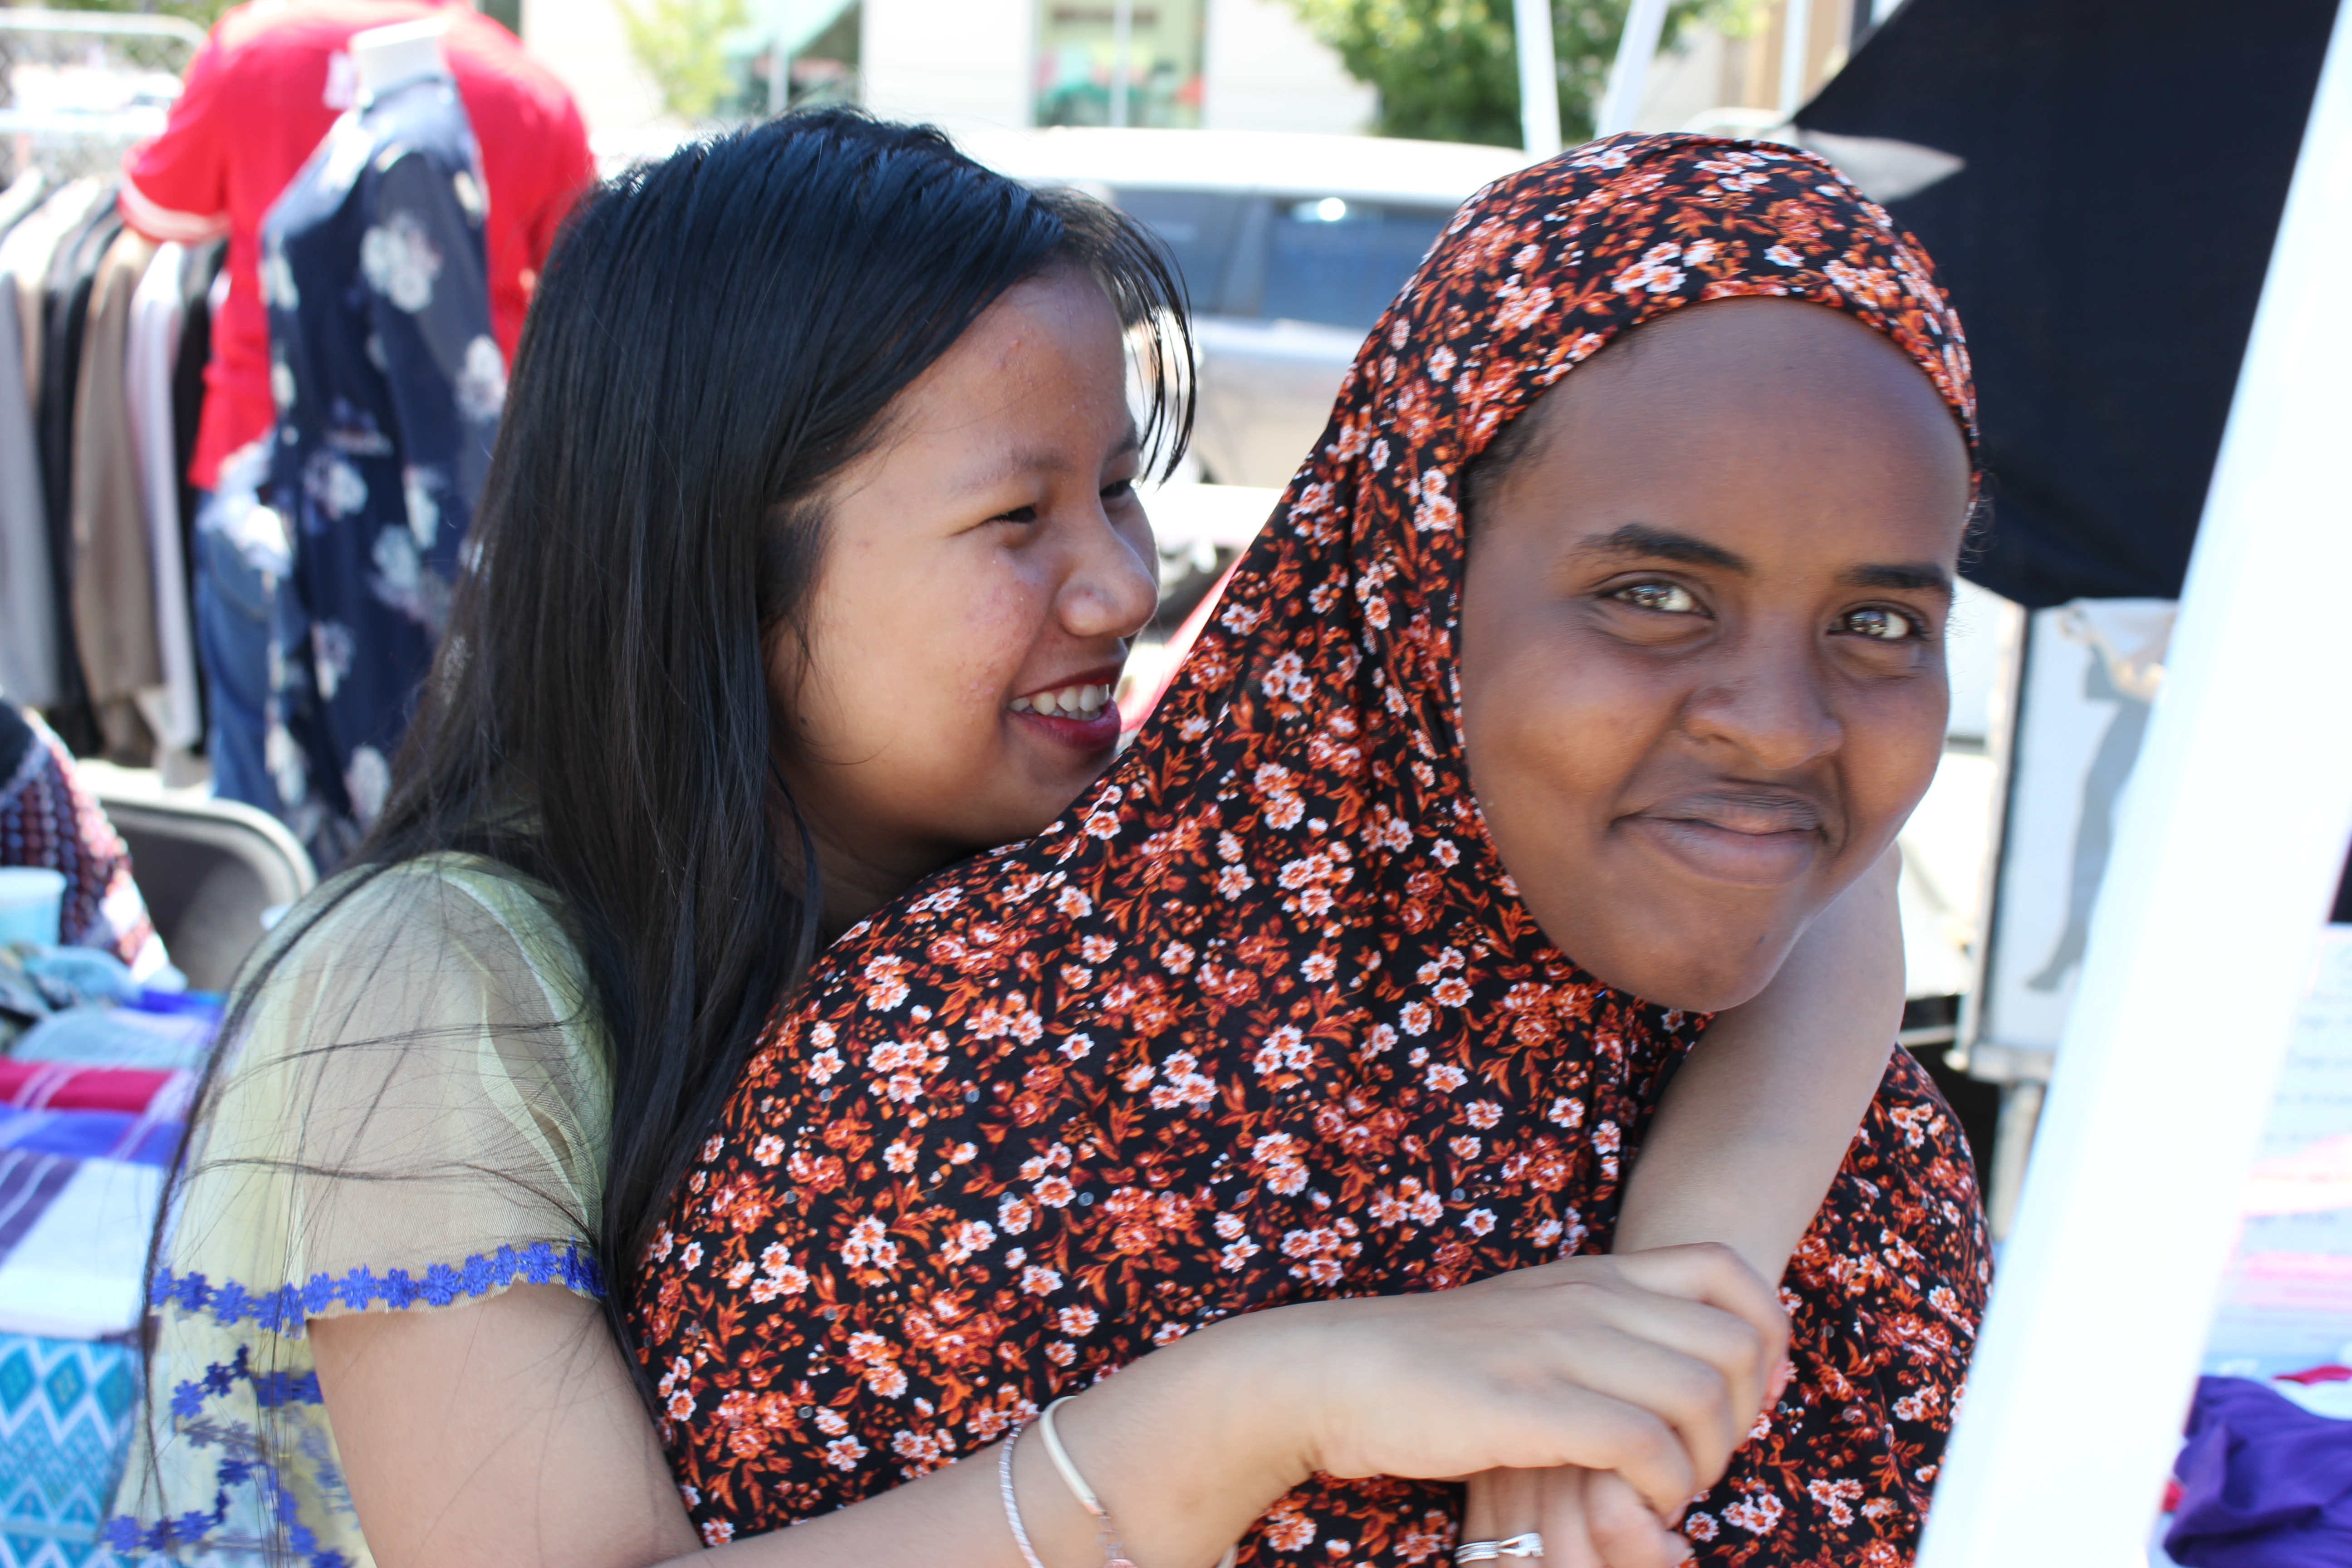 Artists & Friends - Burma & Somalia